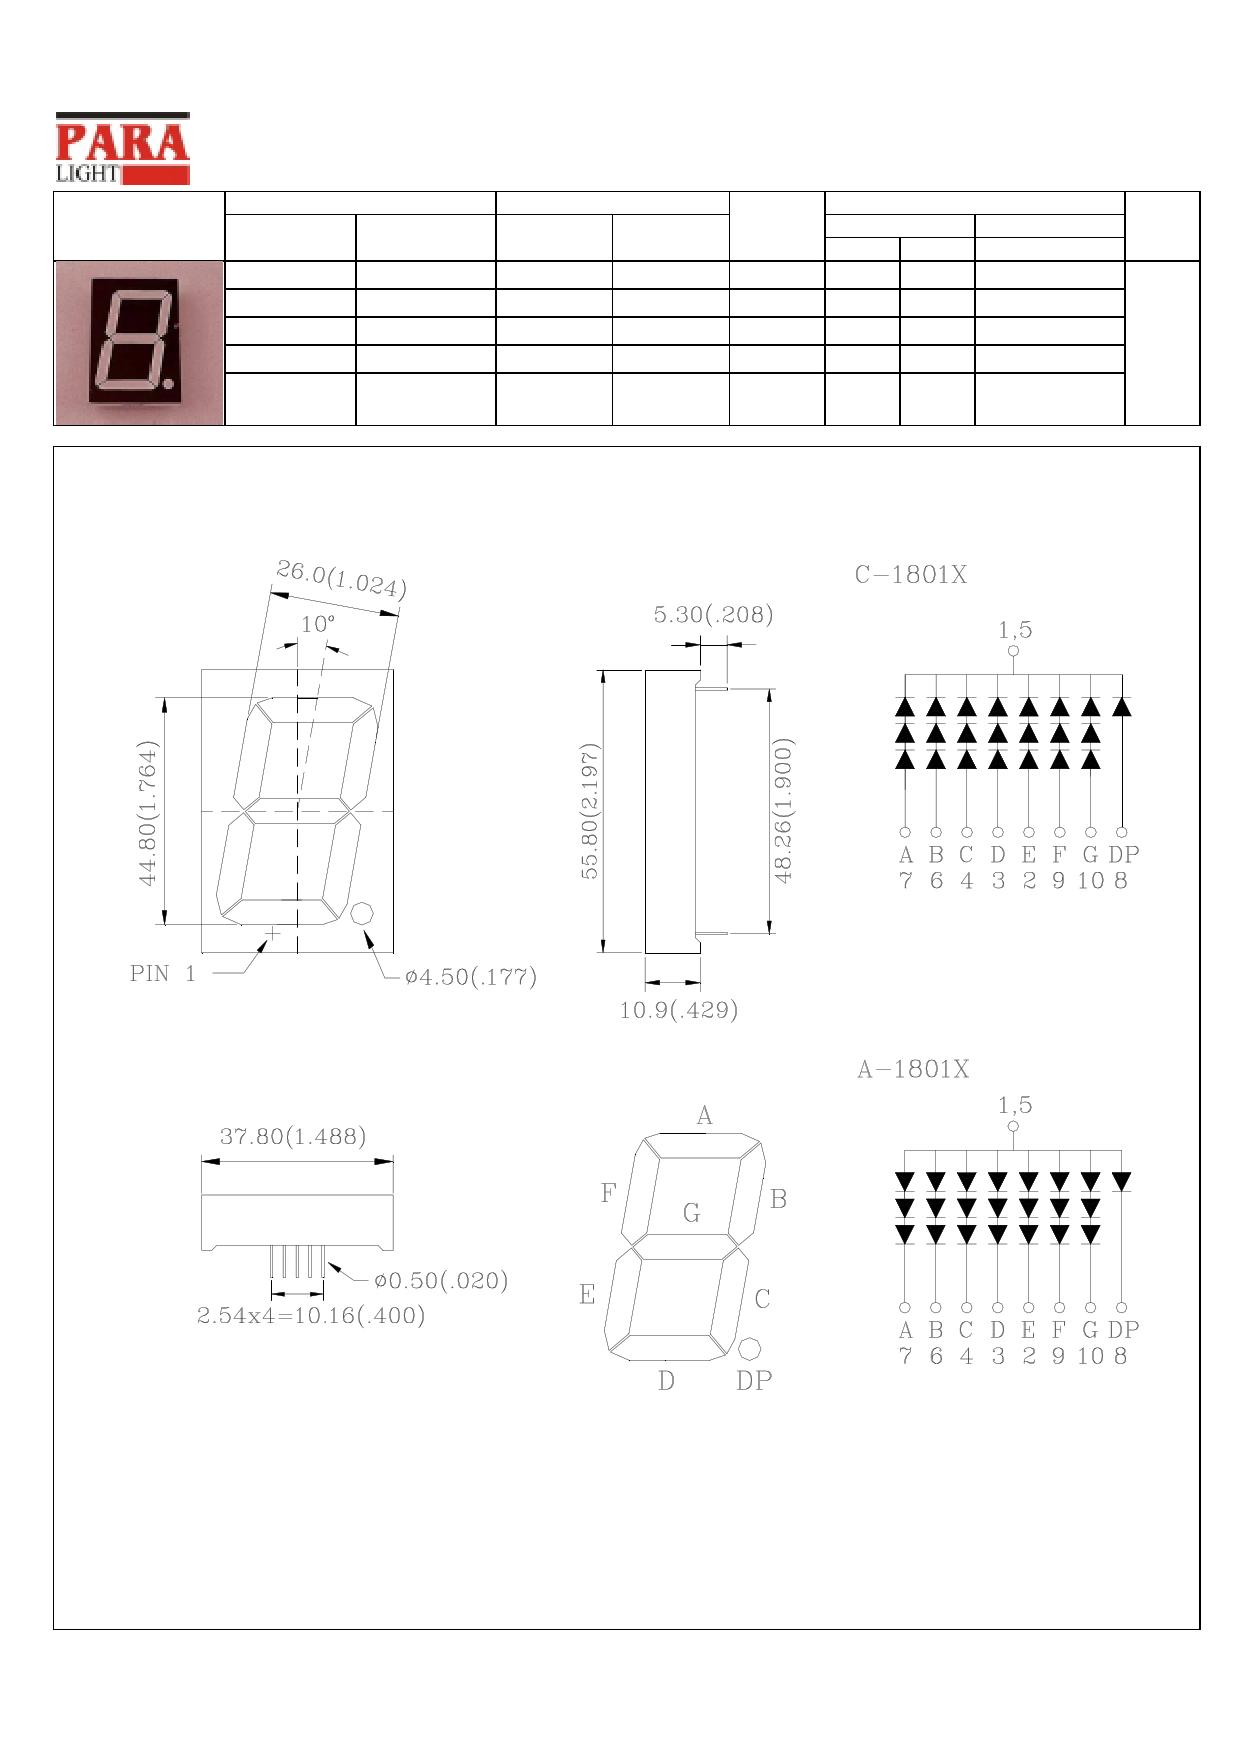 C-1801H datasheet